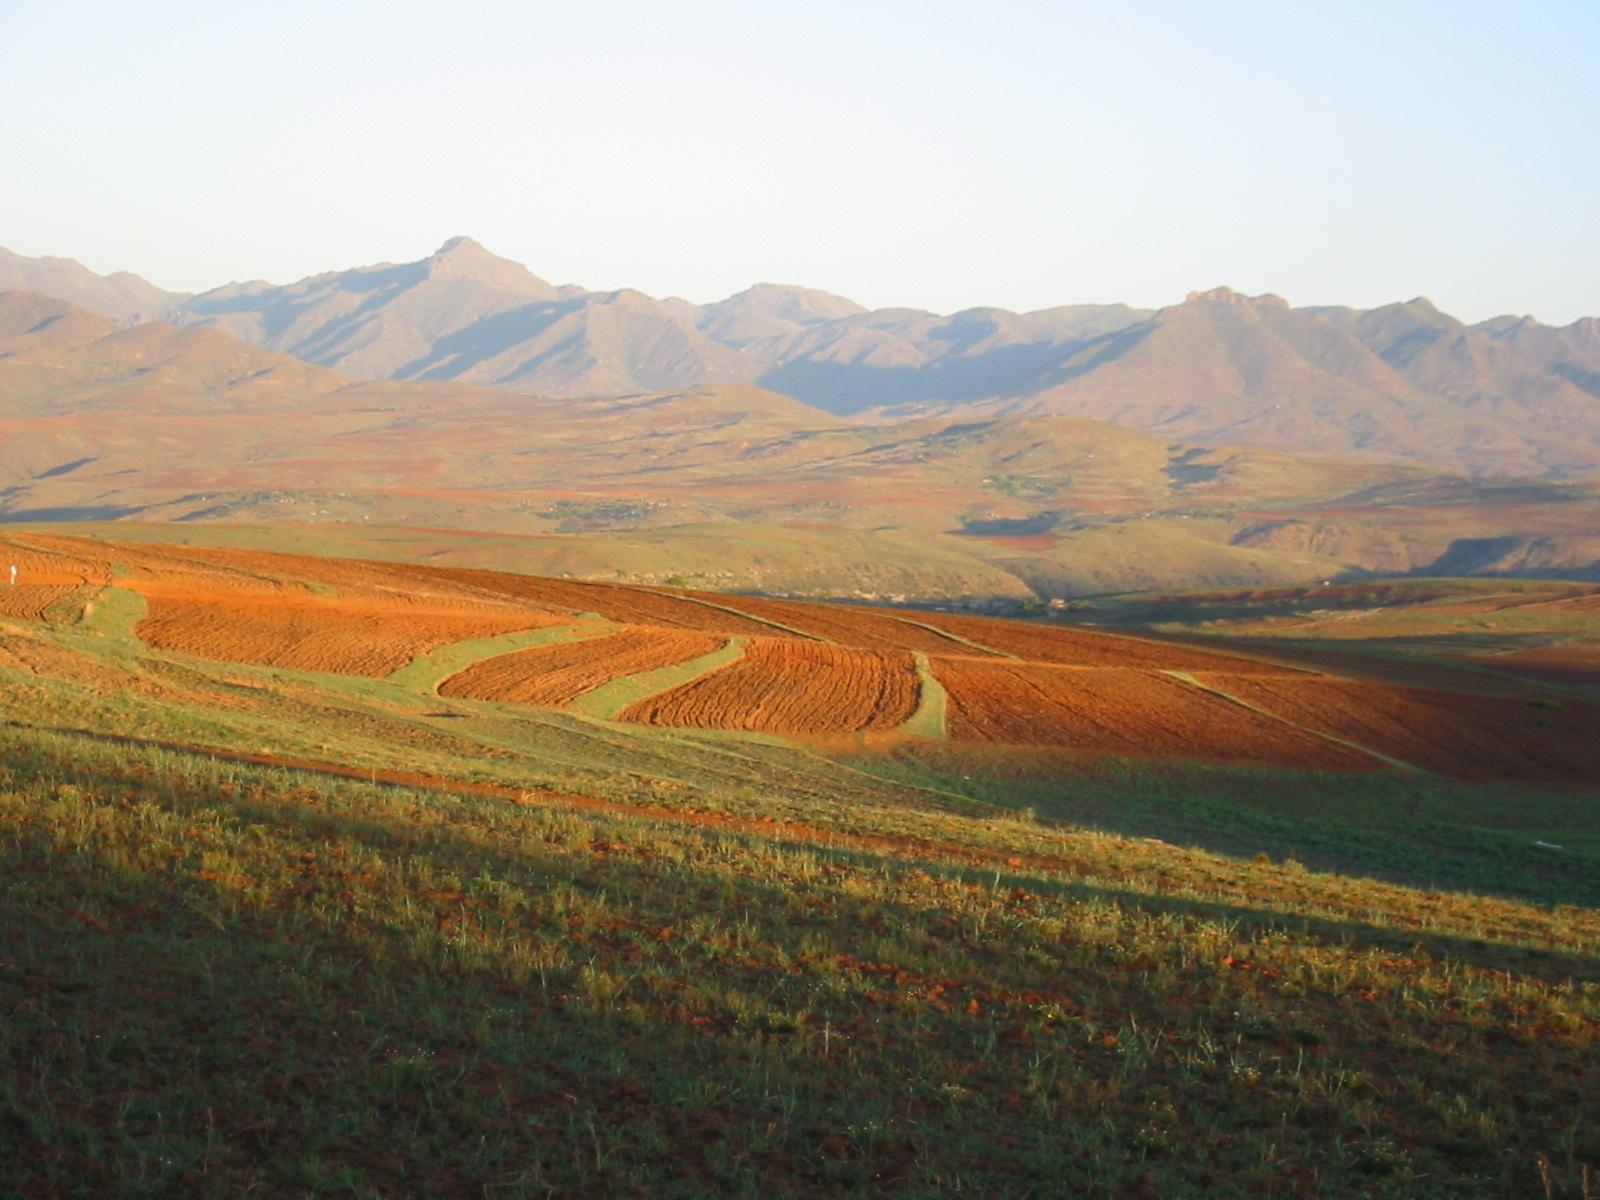 File:African landscape.jpg - Wikimedia Commons